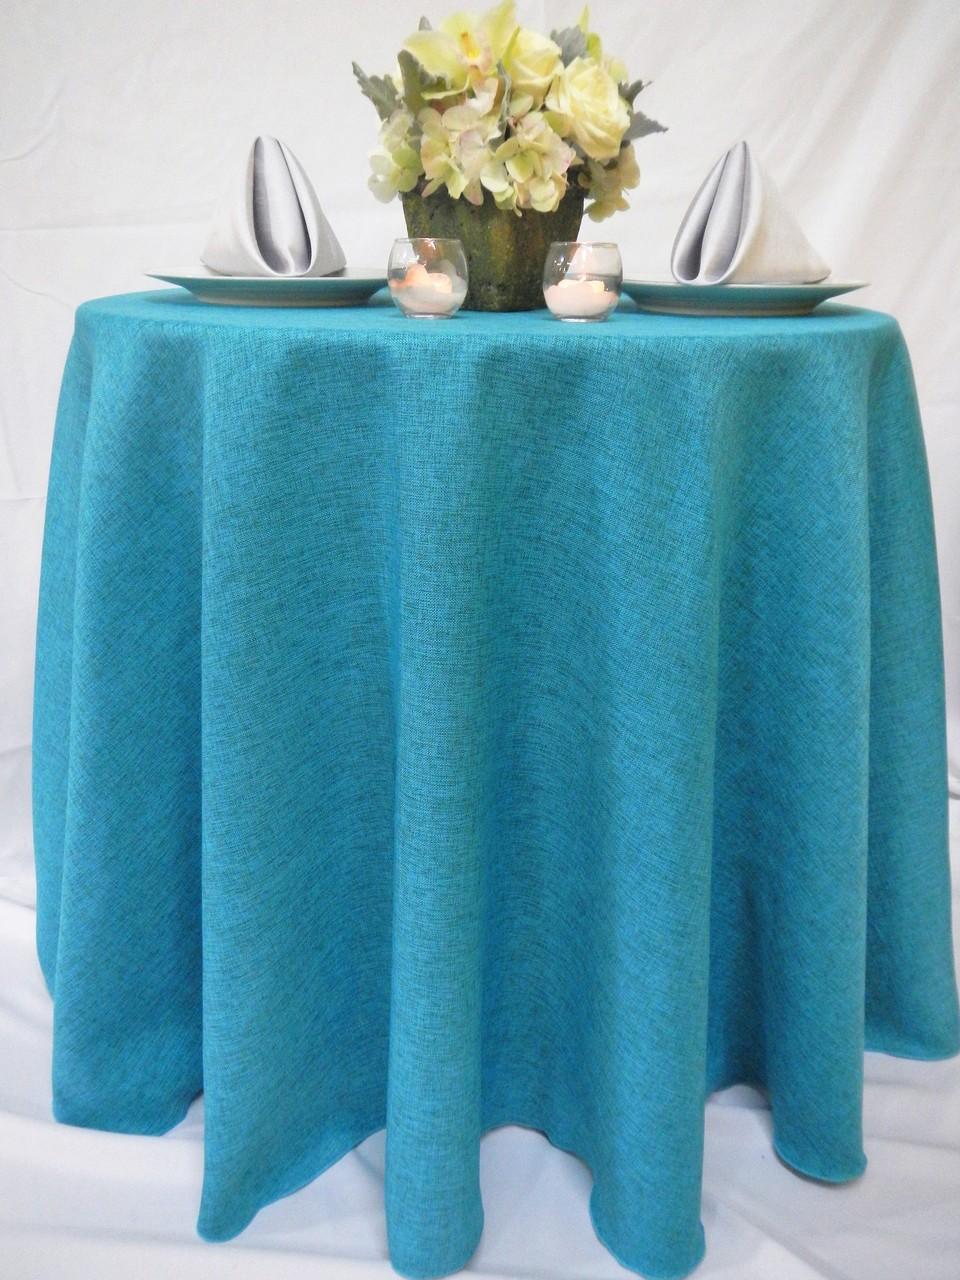 Dublin Rustic Faux Irish Tablecloth Linen ...